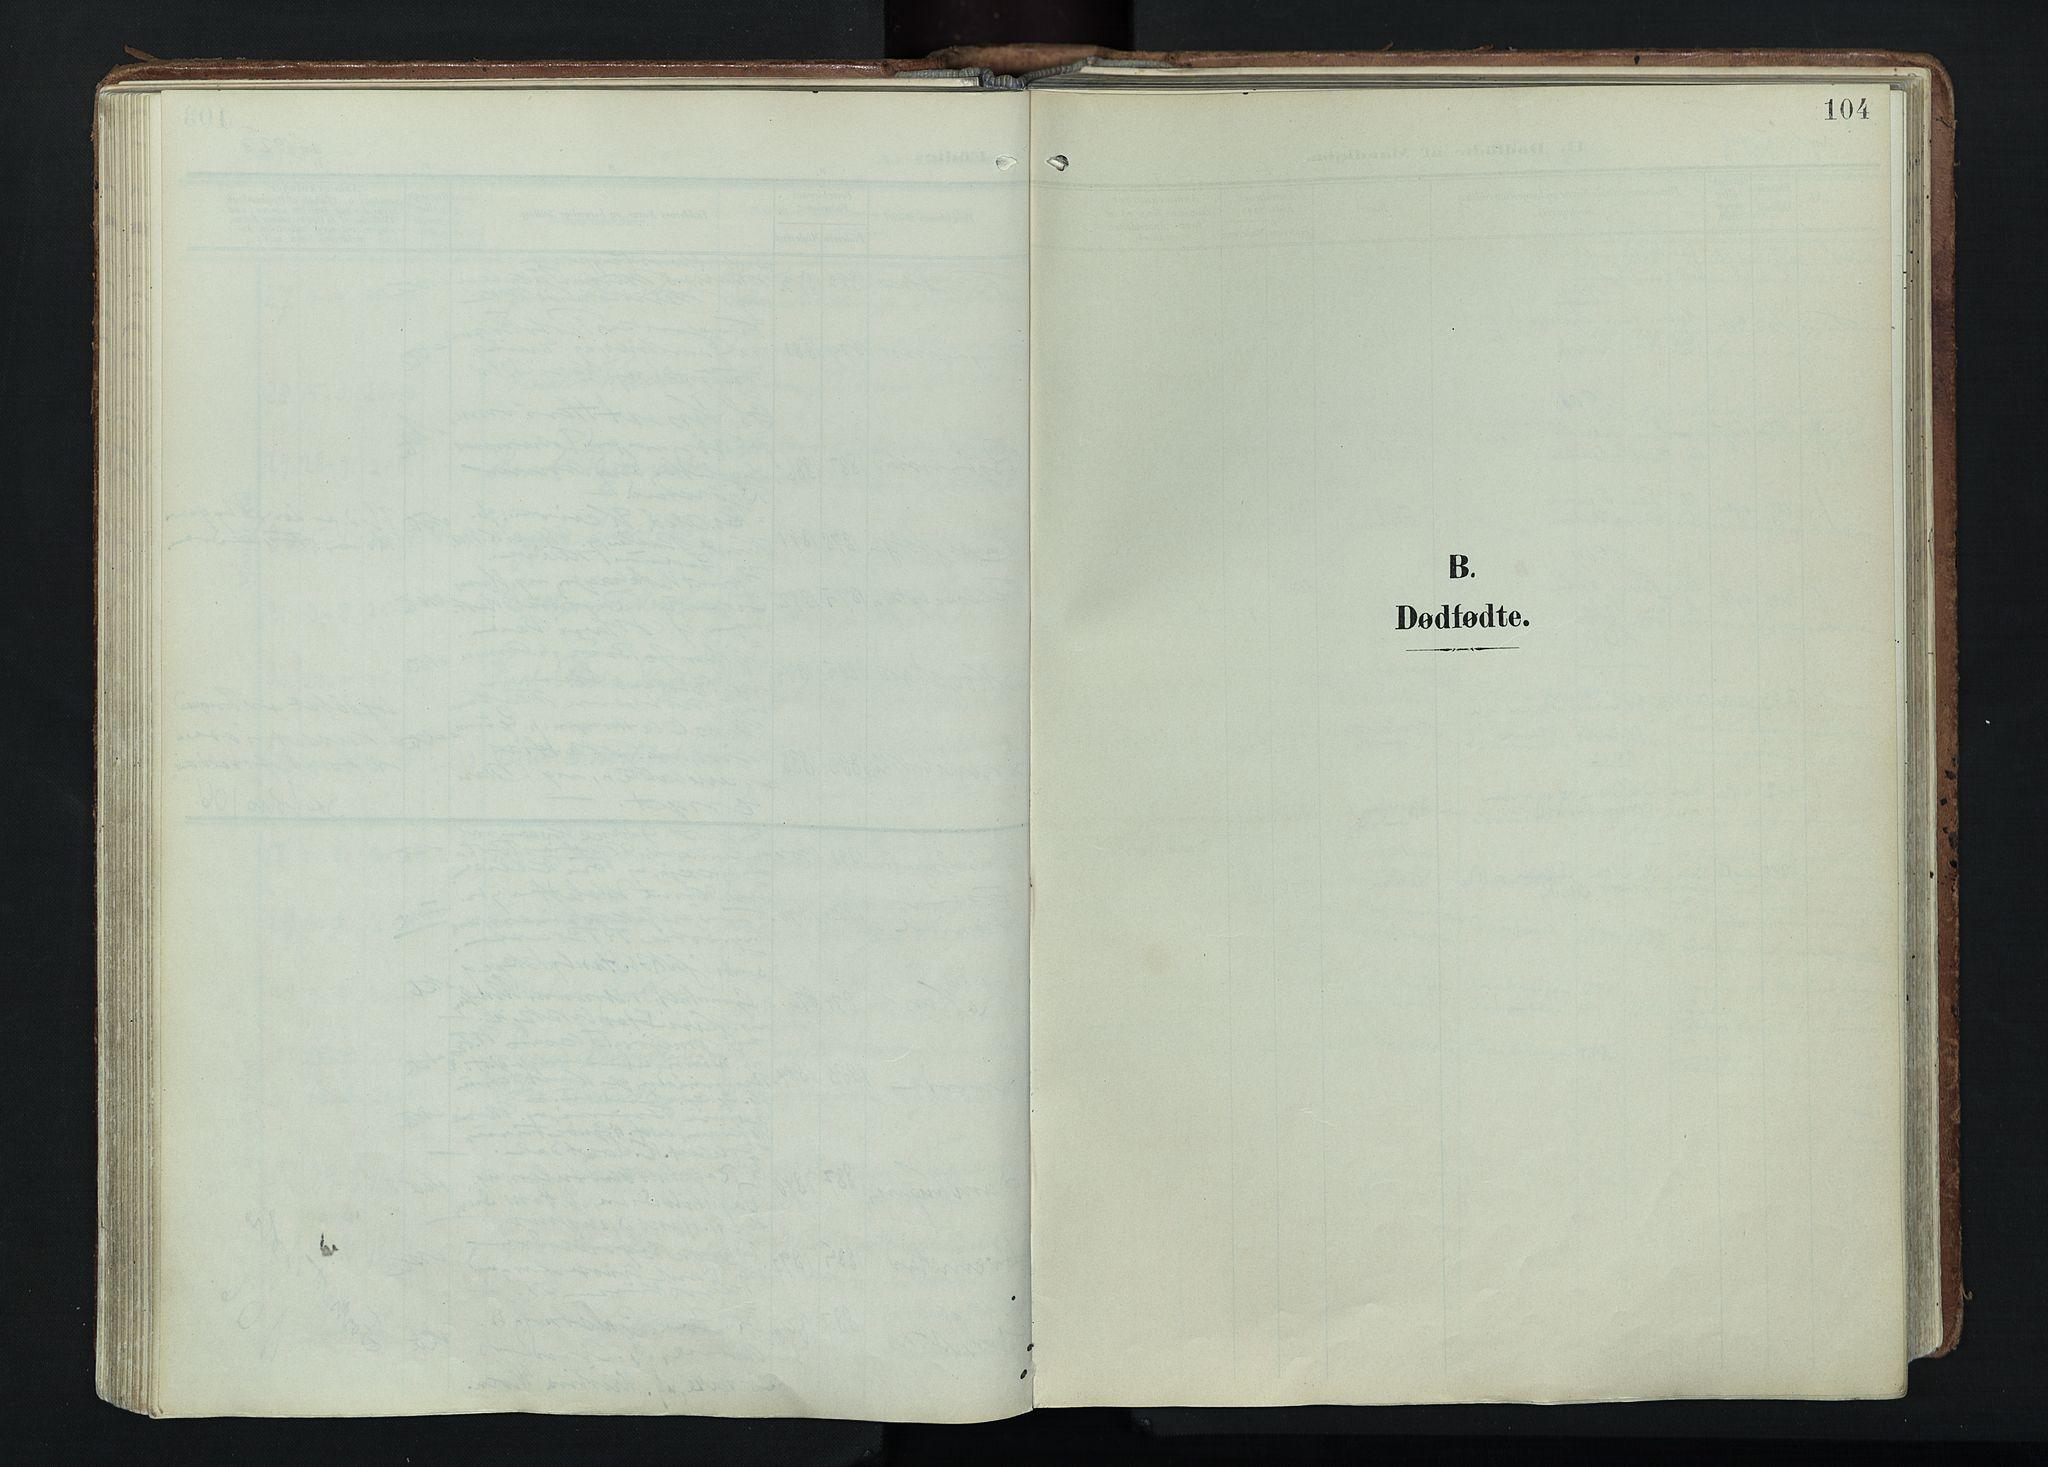 SAH, Vågå prestekontor, Ministerialbok nr. 11, 1905-1924, s. 104